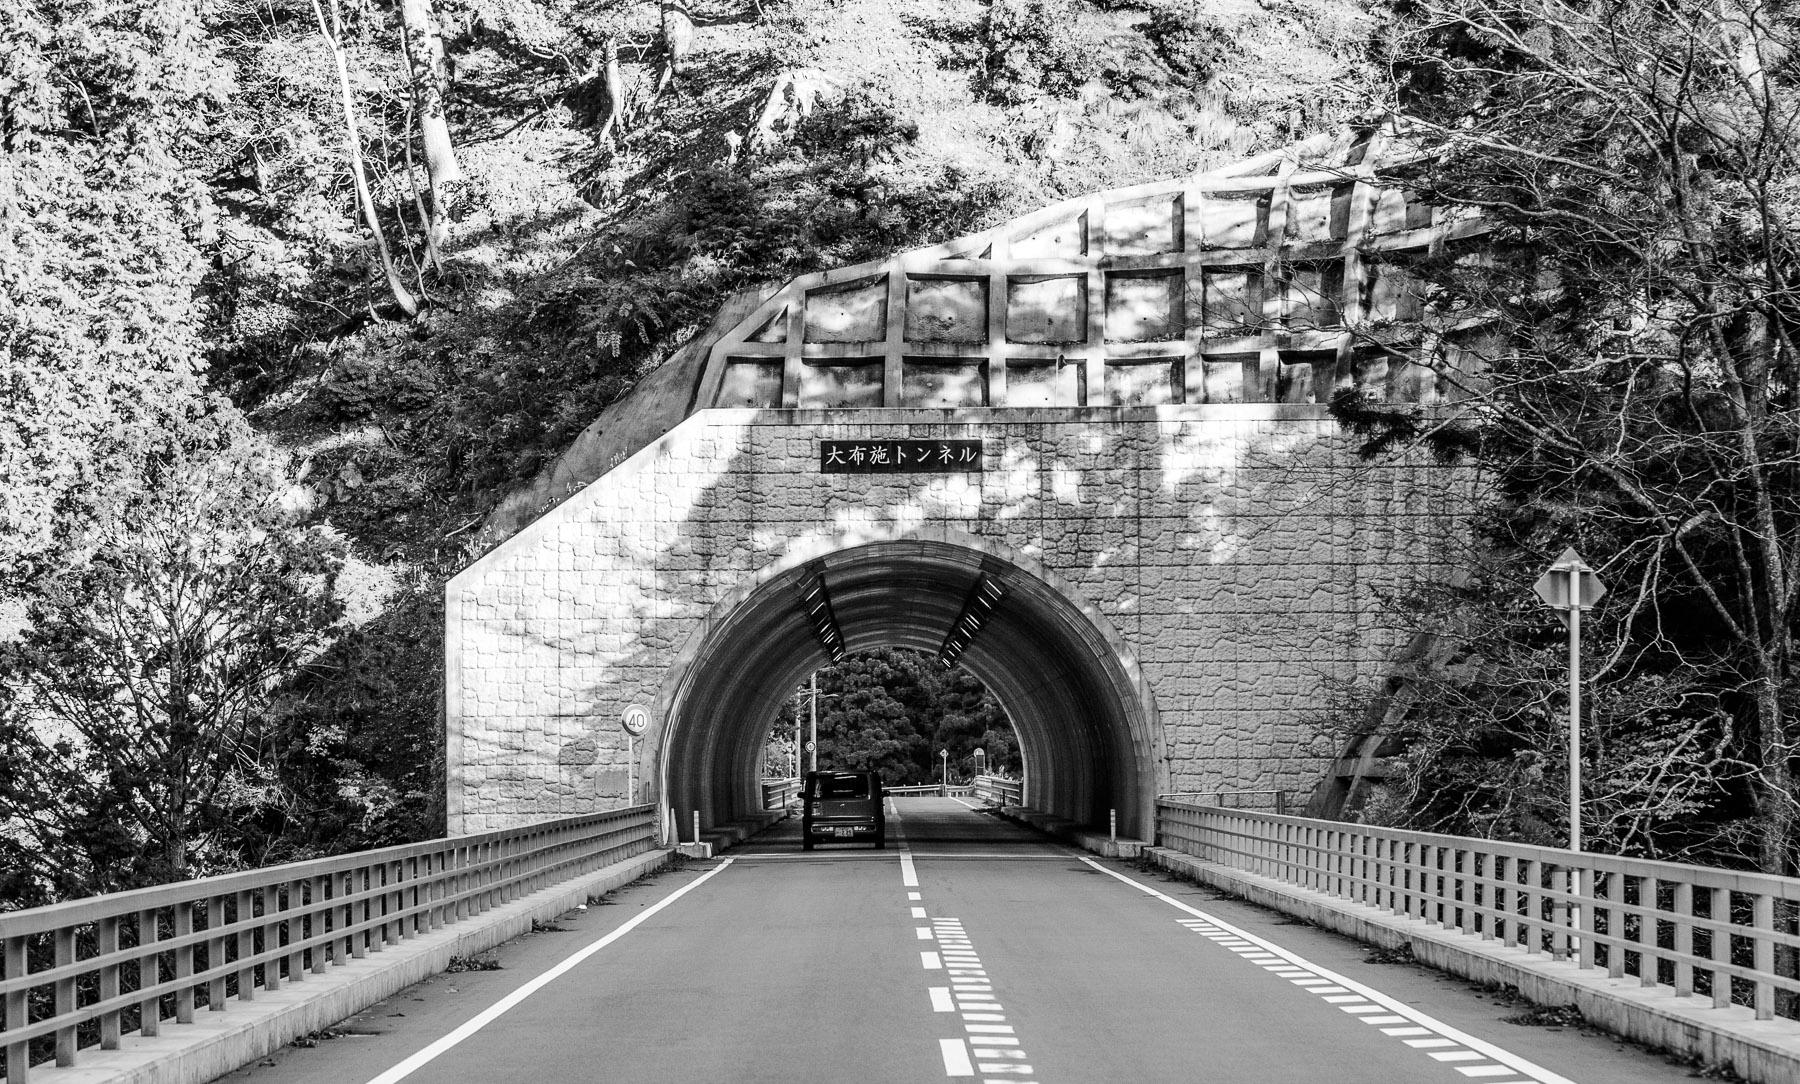 Jeffrey Friedl's Blog » Kyoto's Road to Somewhere